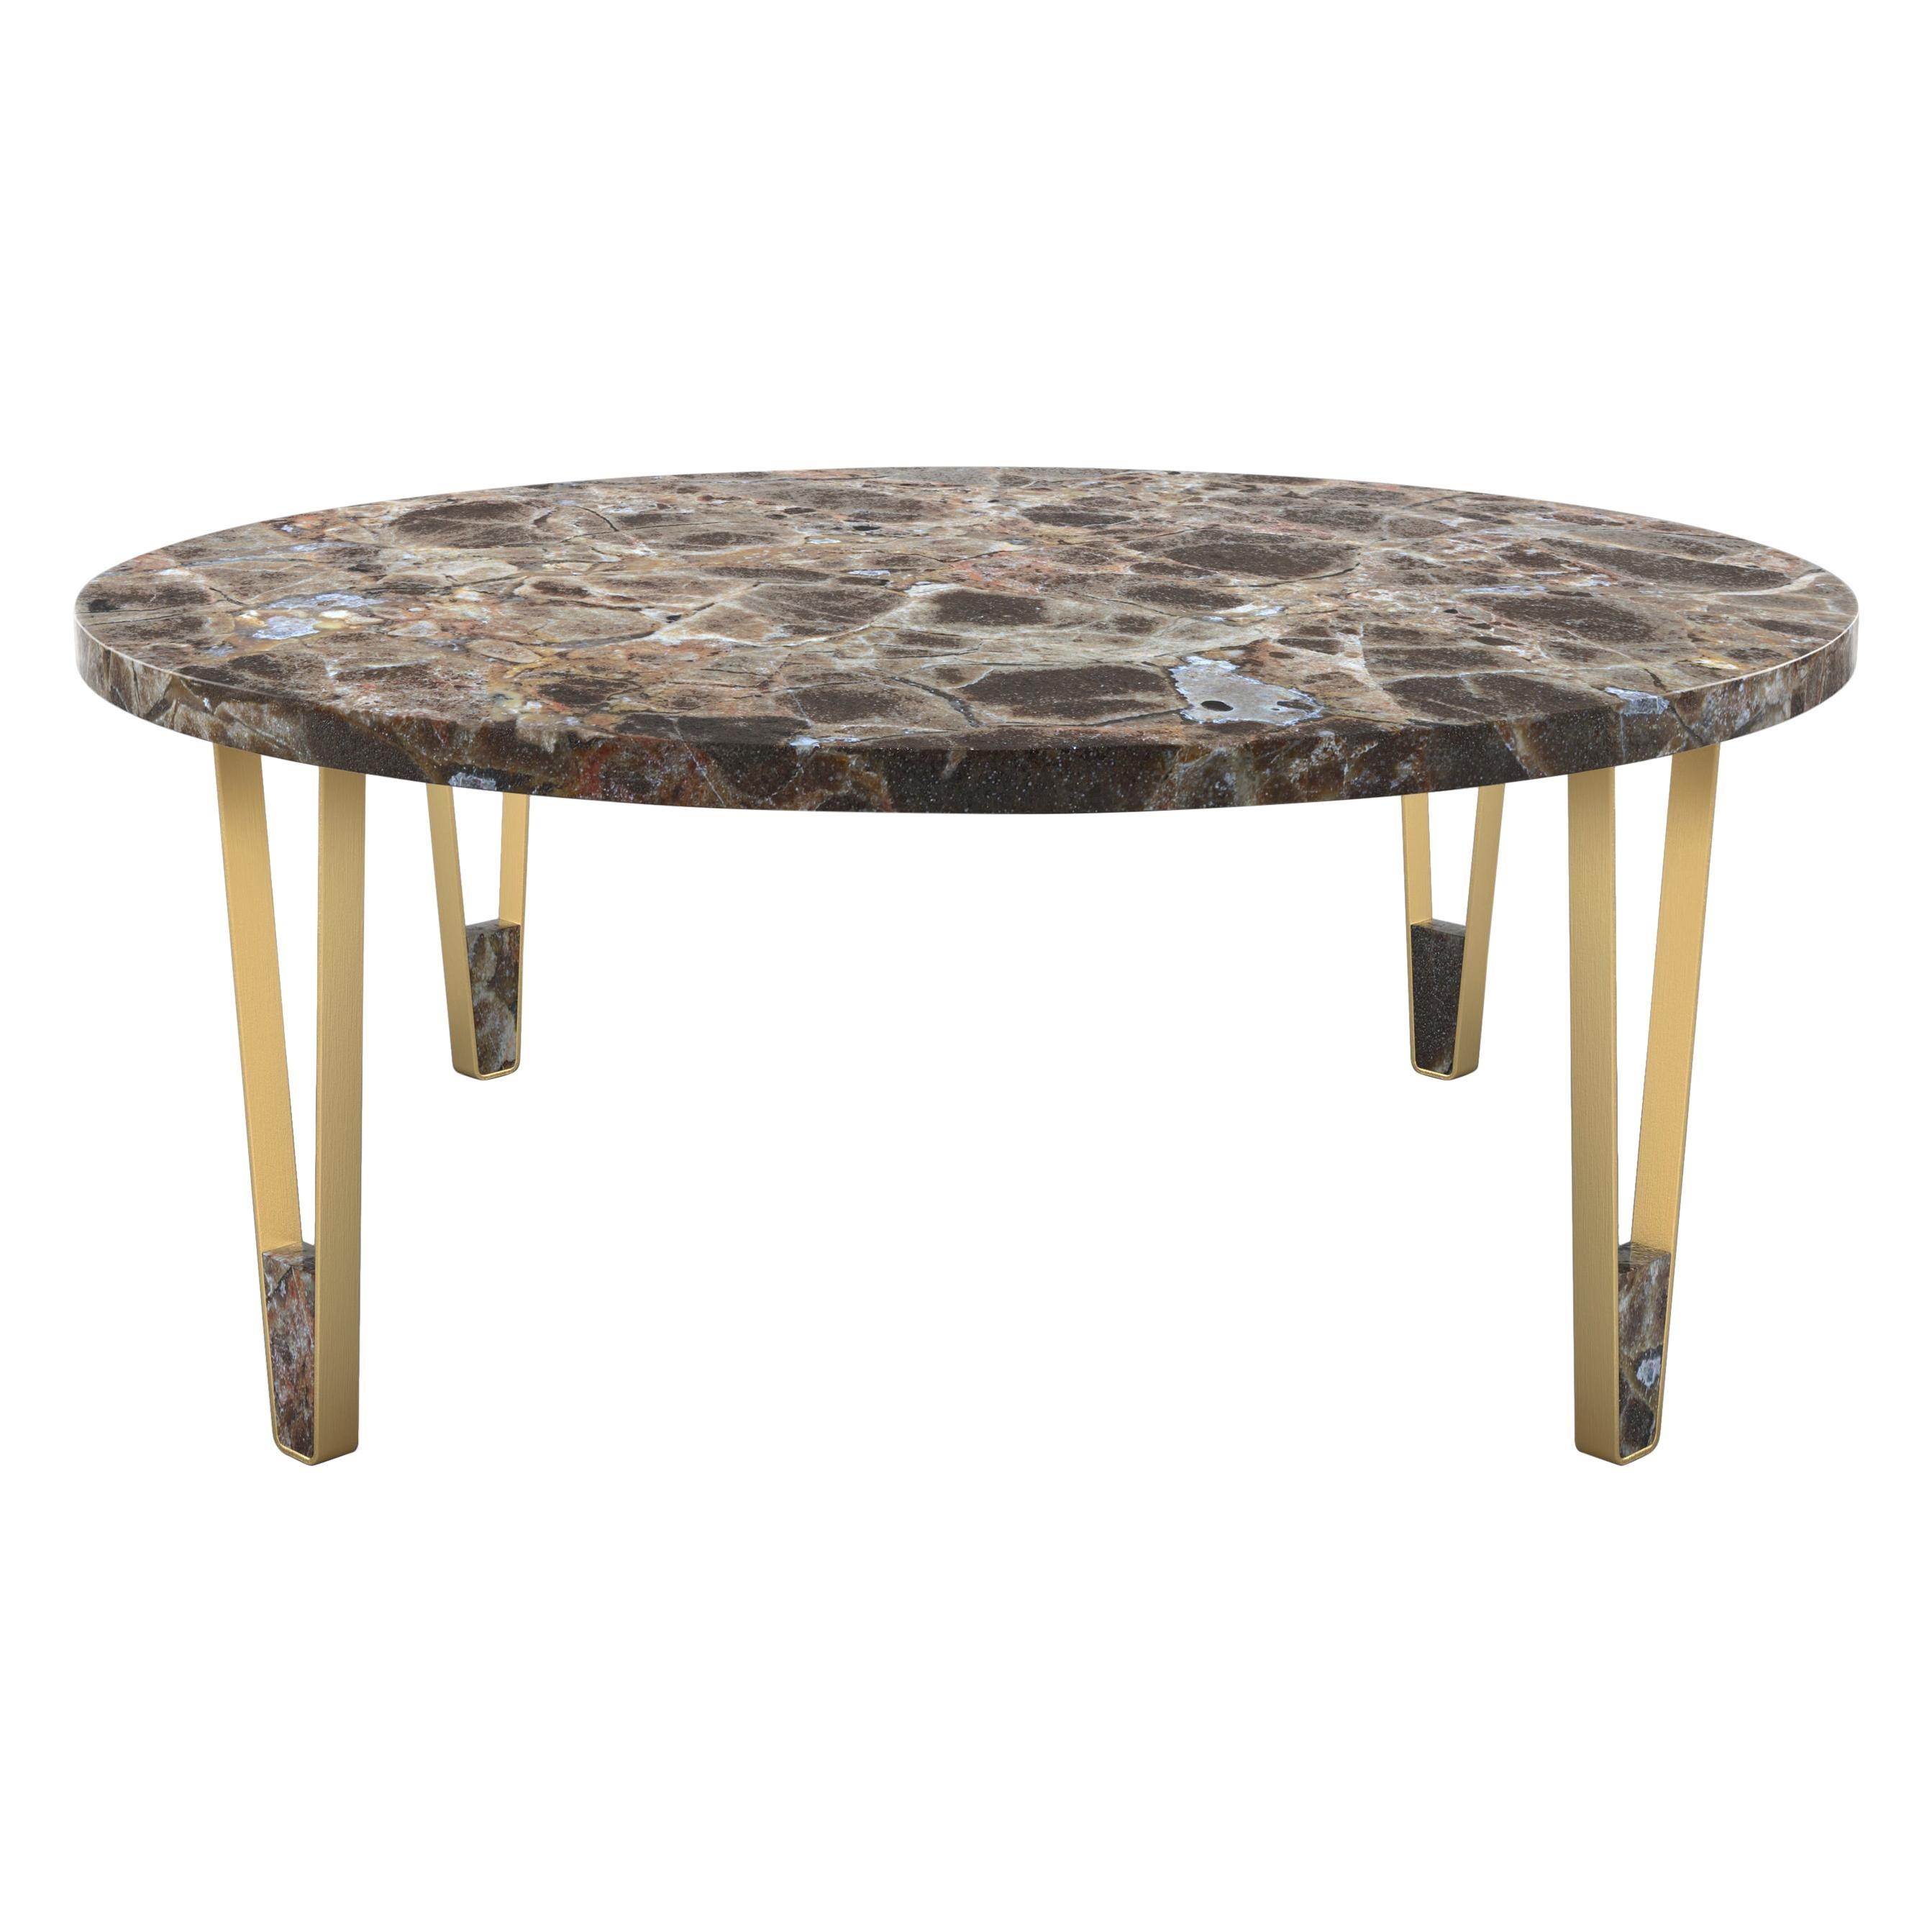 Ionic Round Coffee Table, Dark Emperador, Insidherland by Joana Santos Barbosa